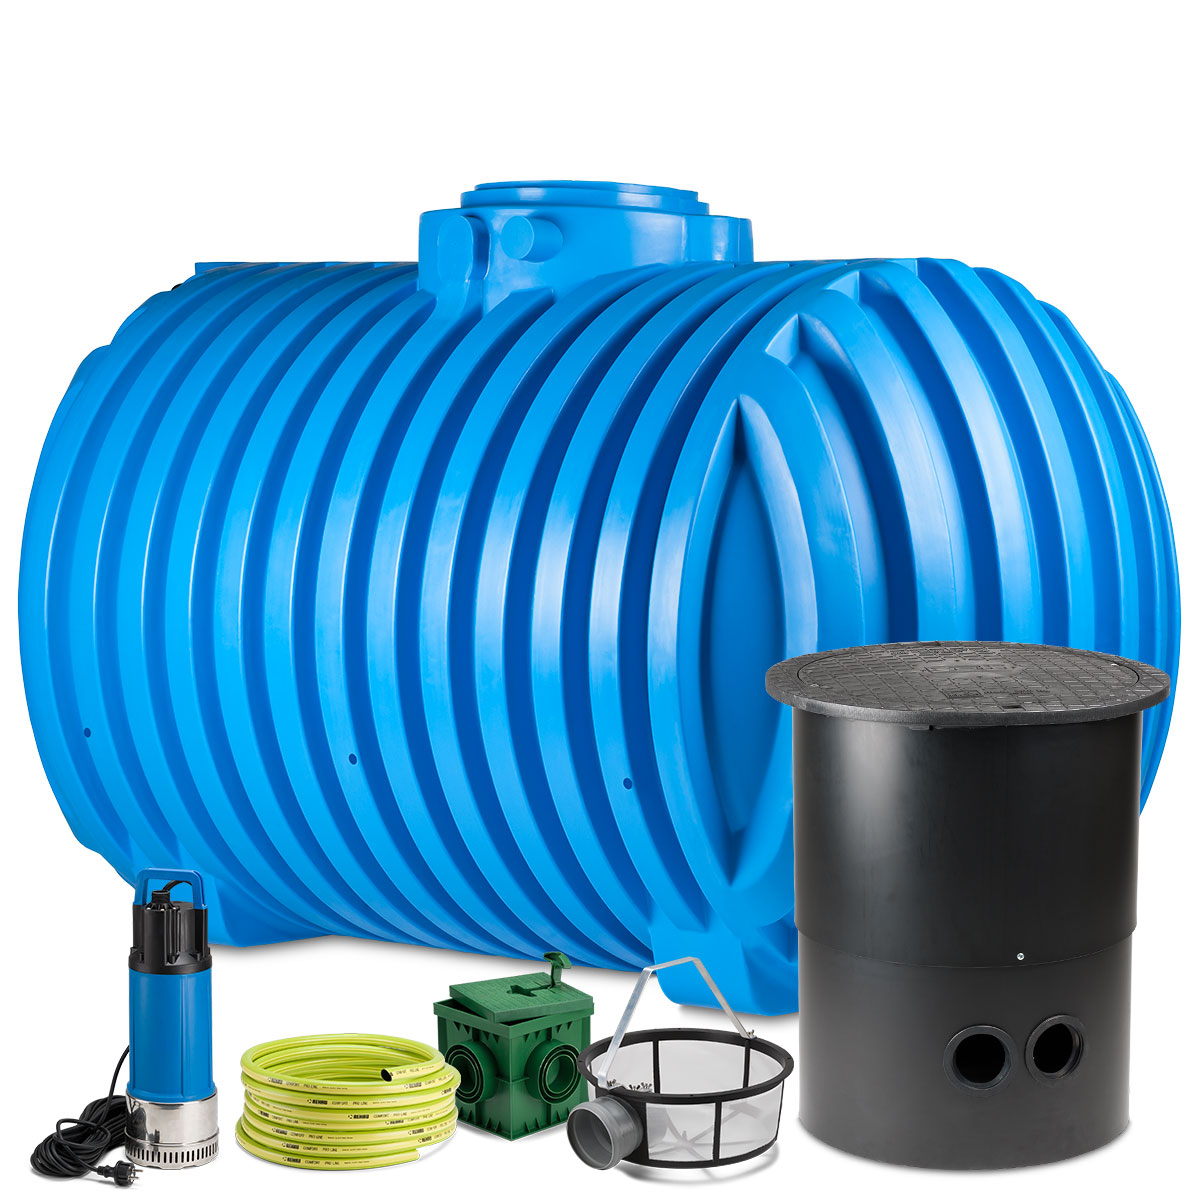 regenwassertank zisterne blue star 6500 l gartenanlage inkl pumpe deckel ebay. Black Bedroom Furniture Sets. Home Design Ideas